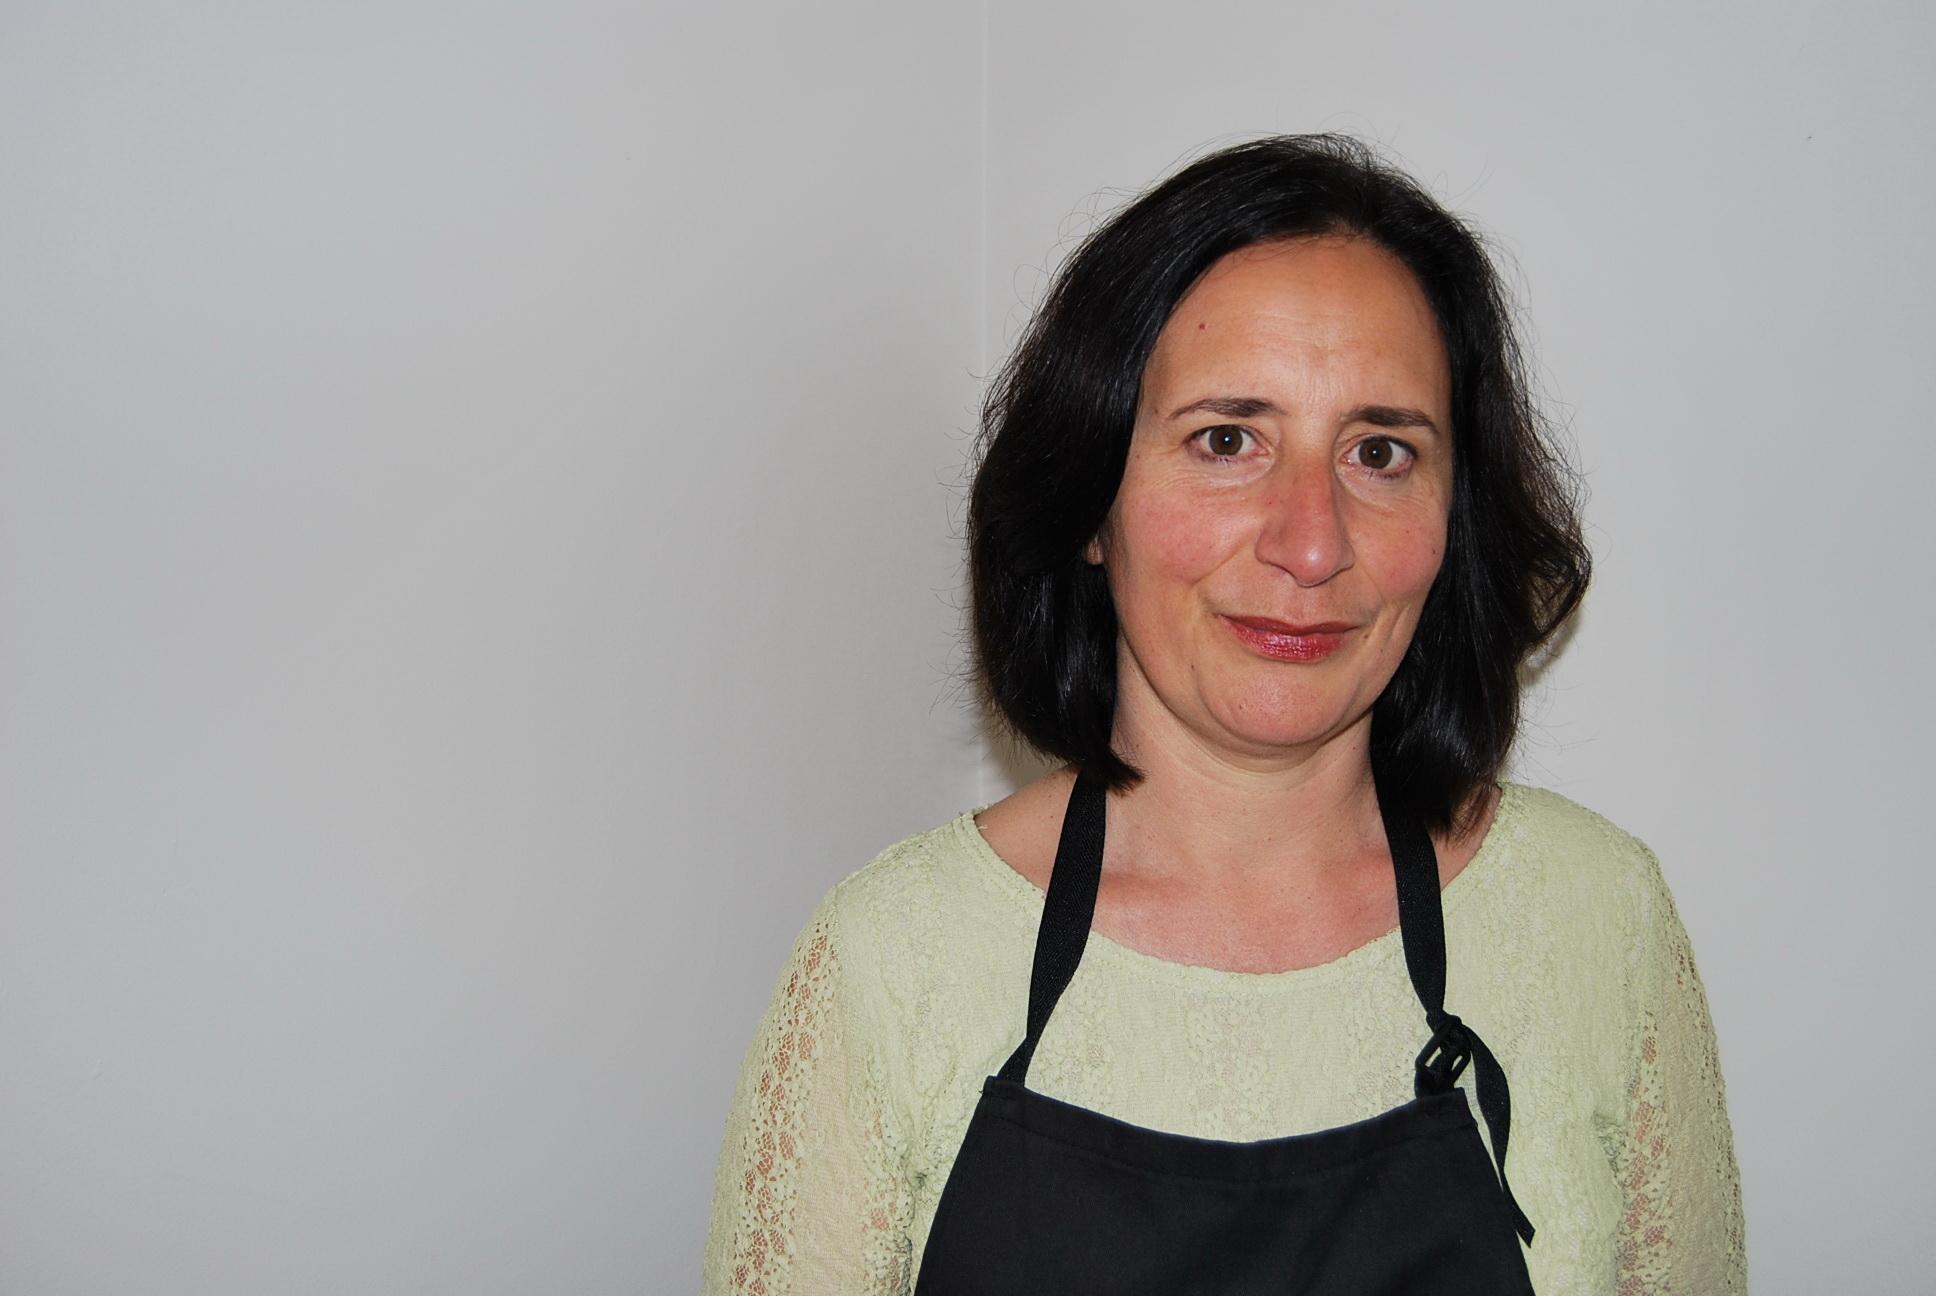 Maria Ciavarella